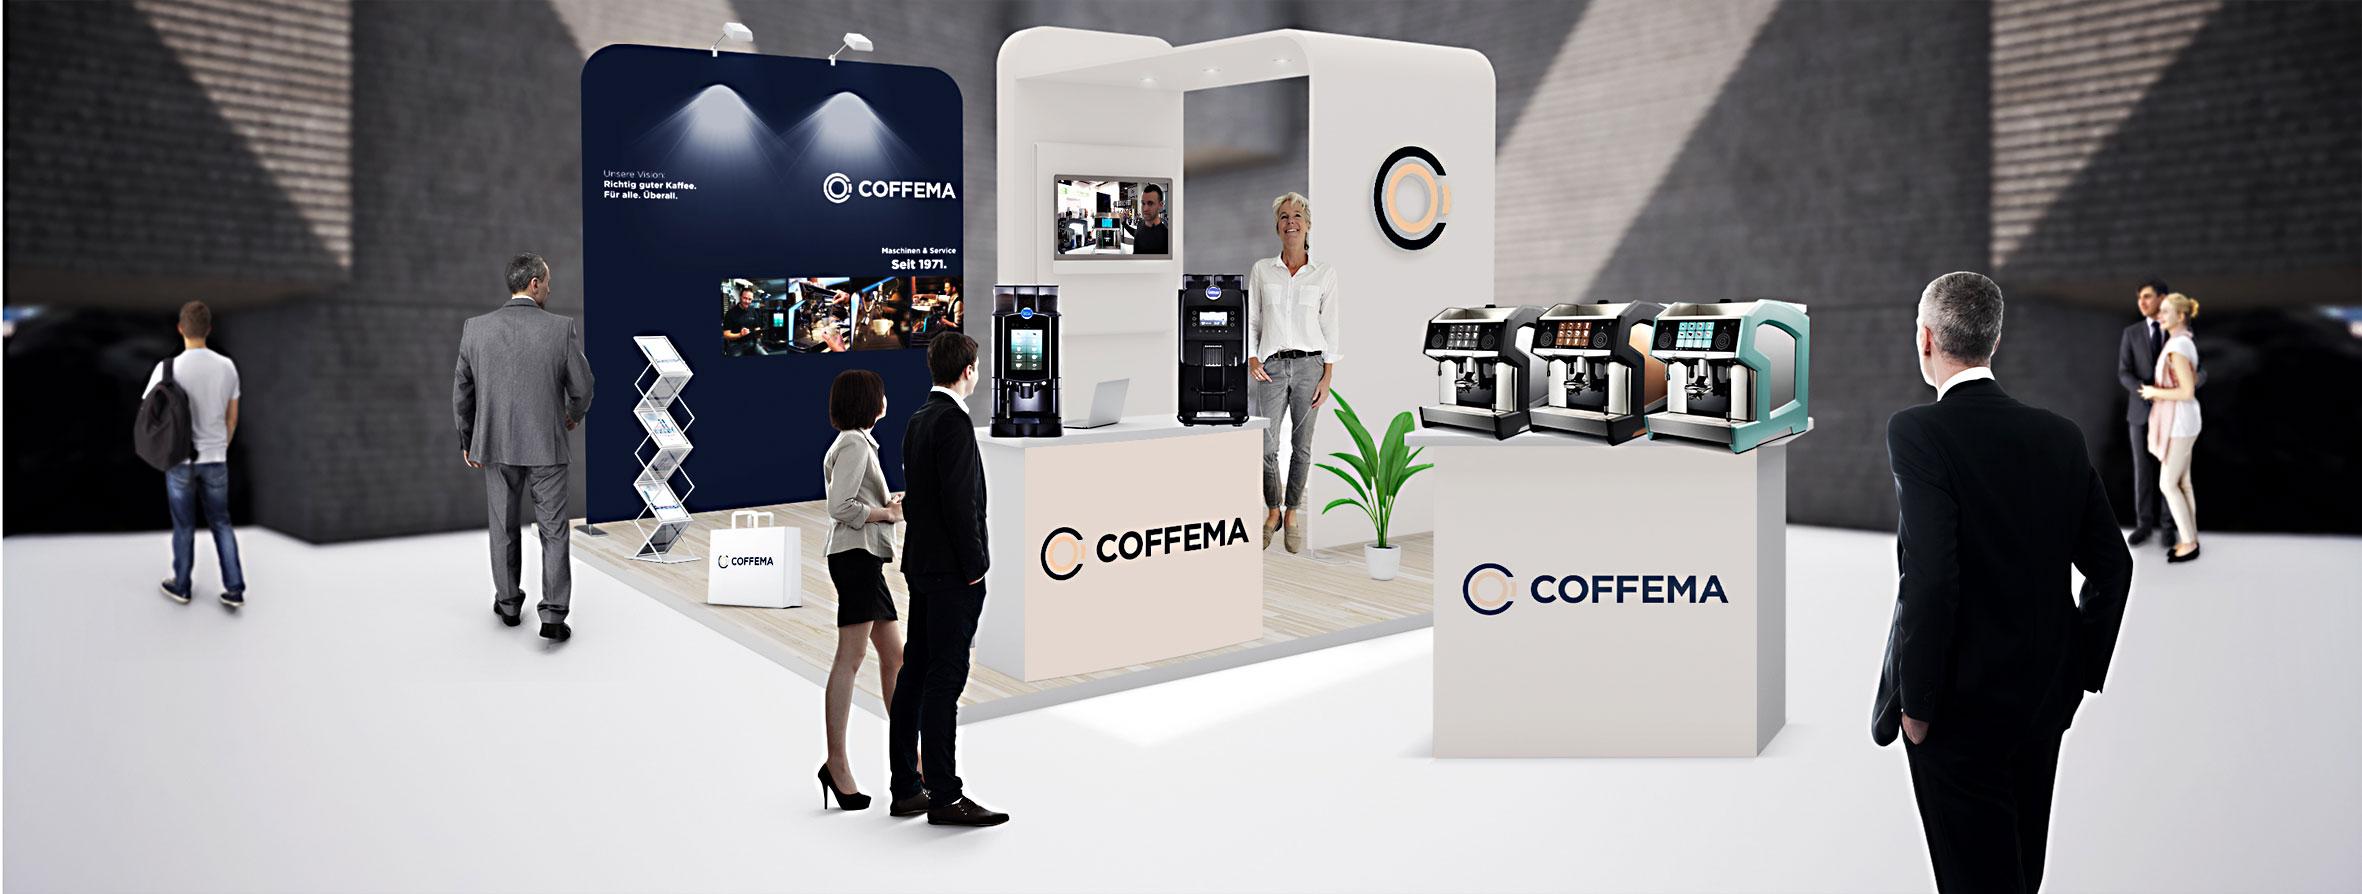 Coffema Vendtra Vending Trade Festival Deutschland